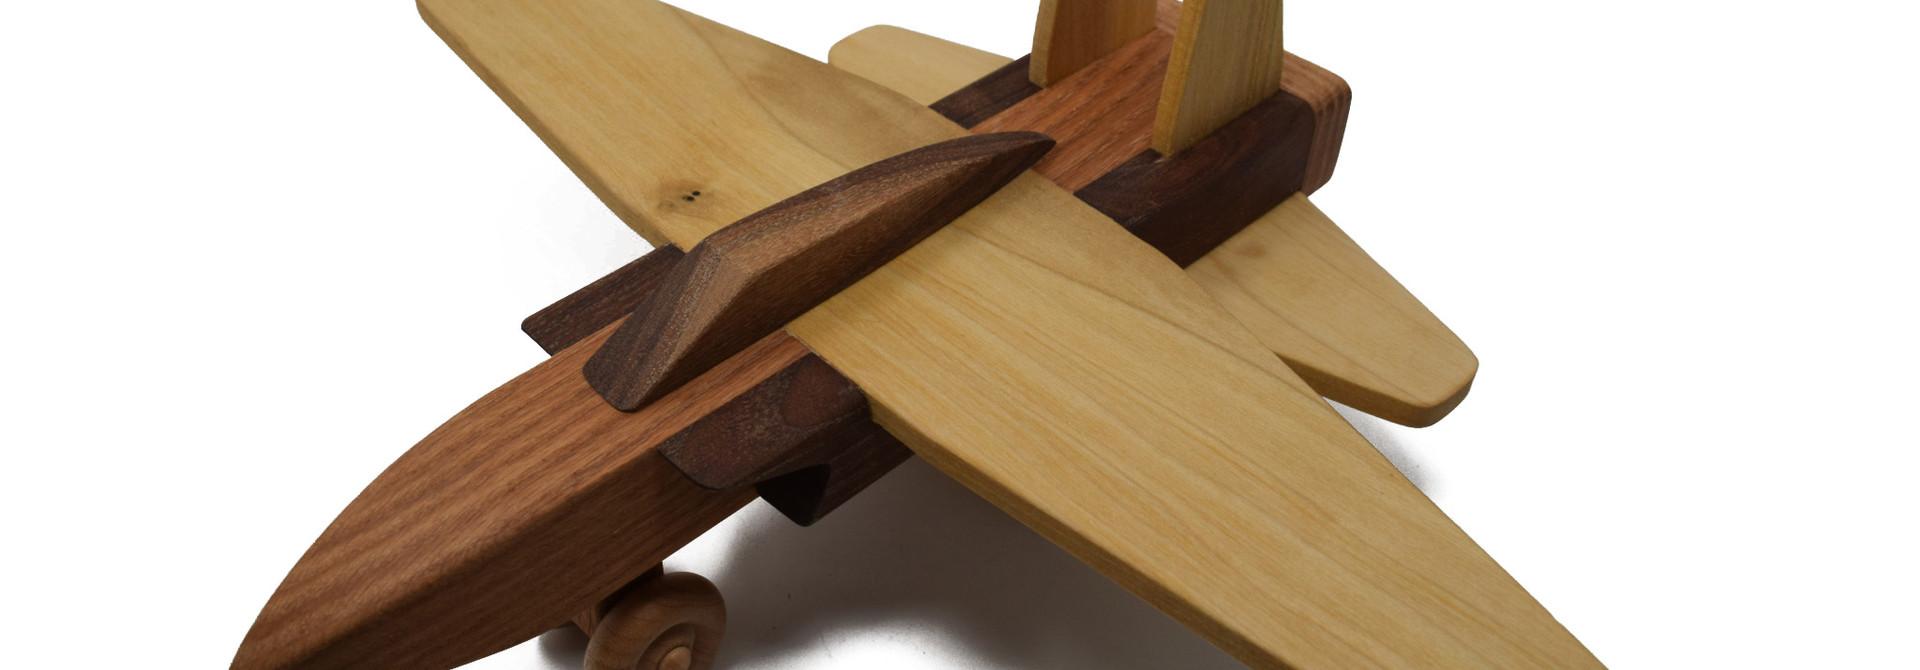 Wooden Jet Toy